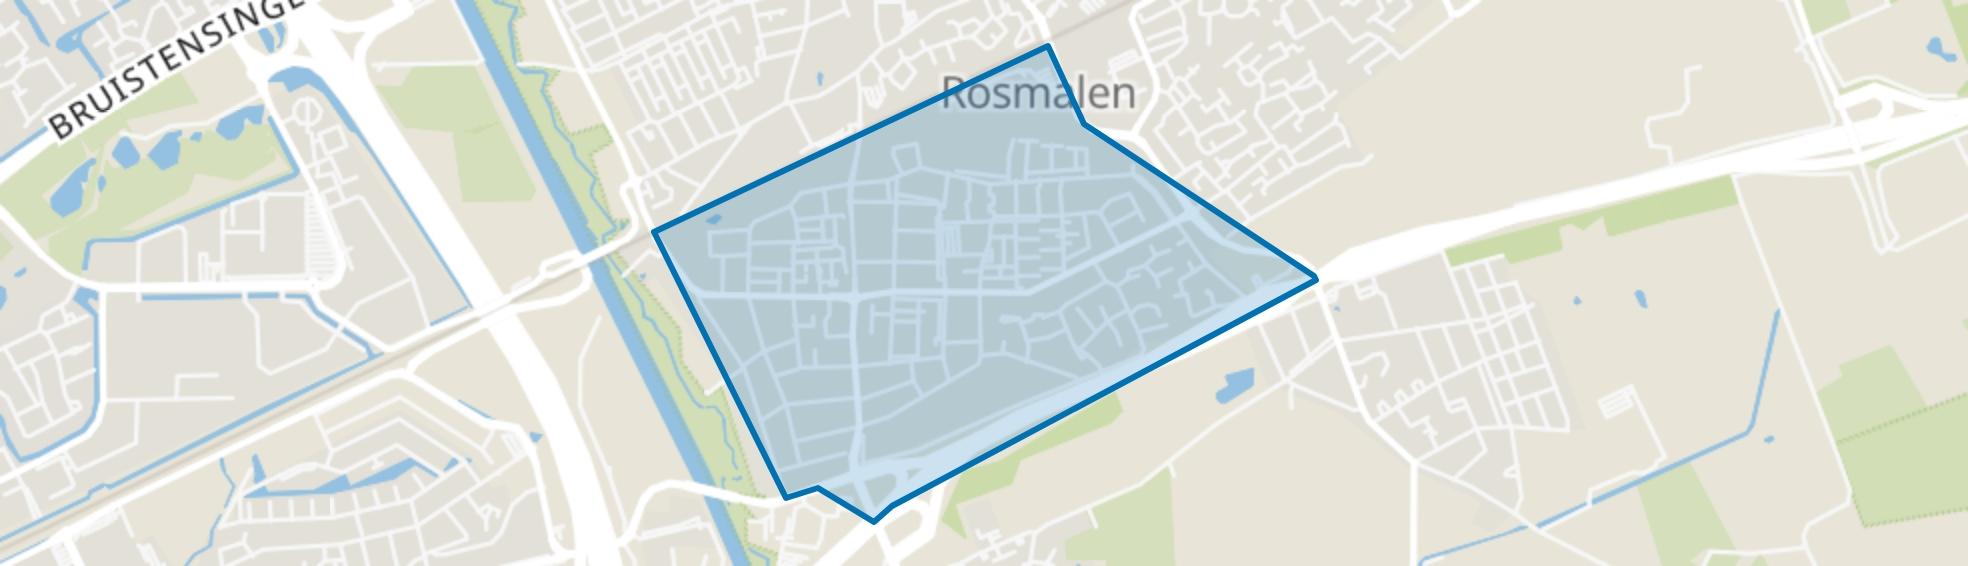 Molenhoek, Rosmalen map